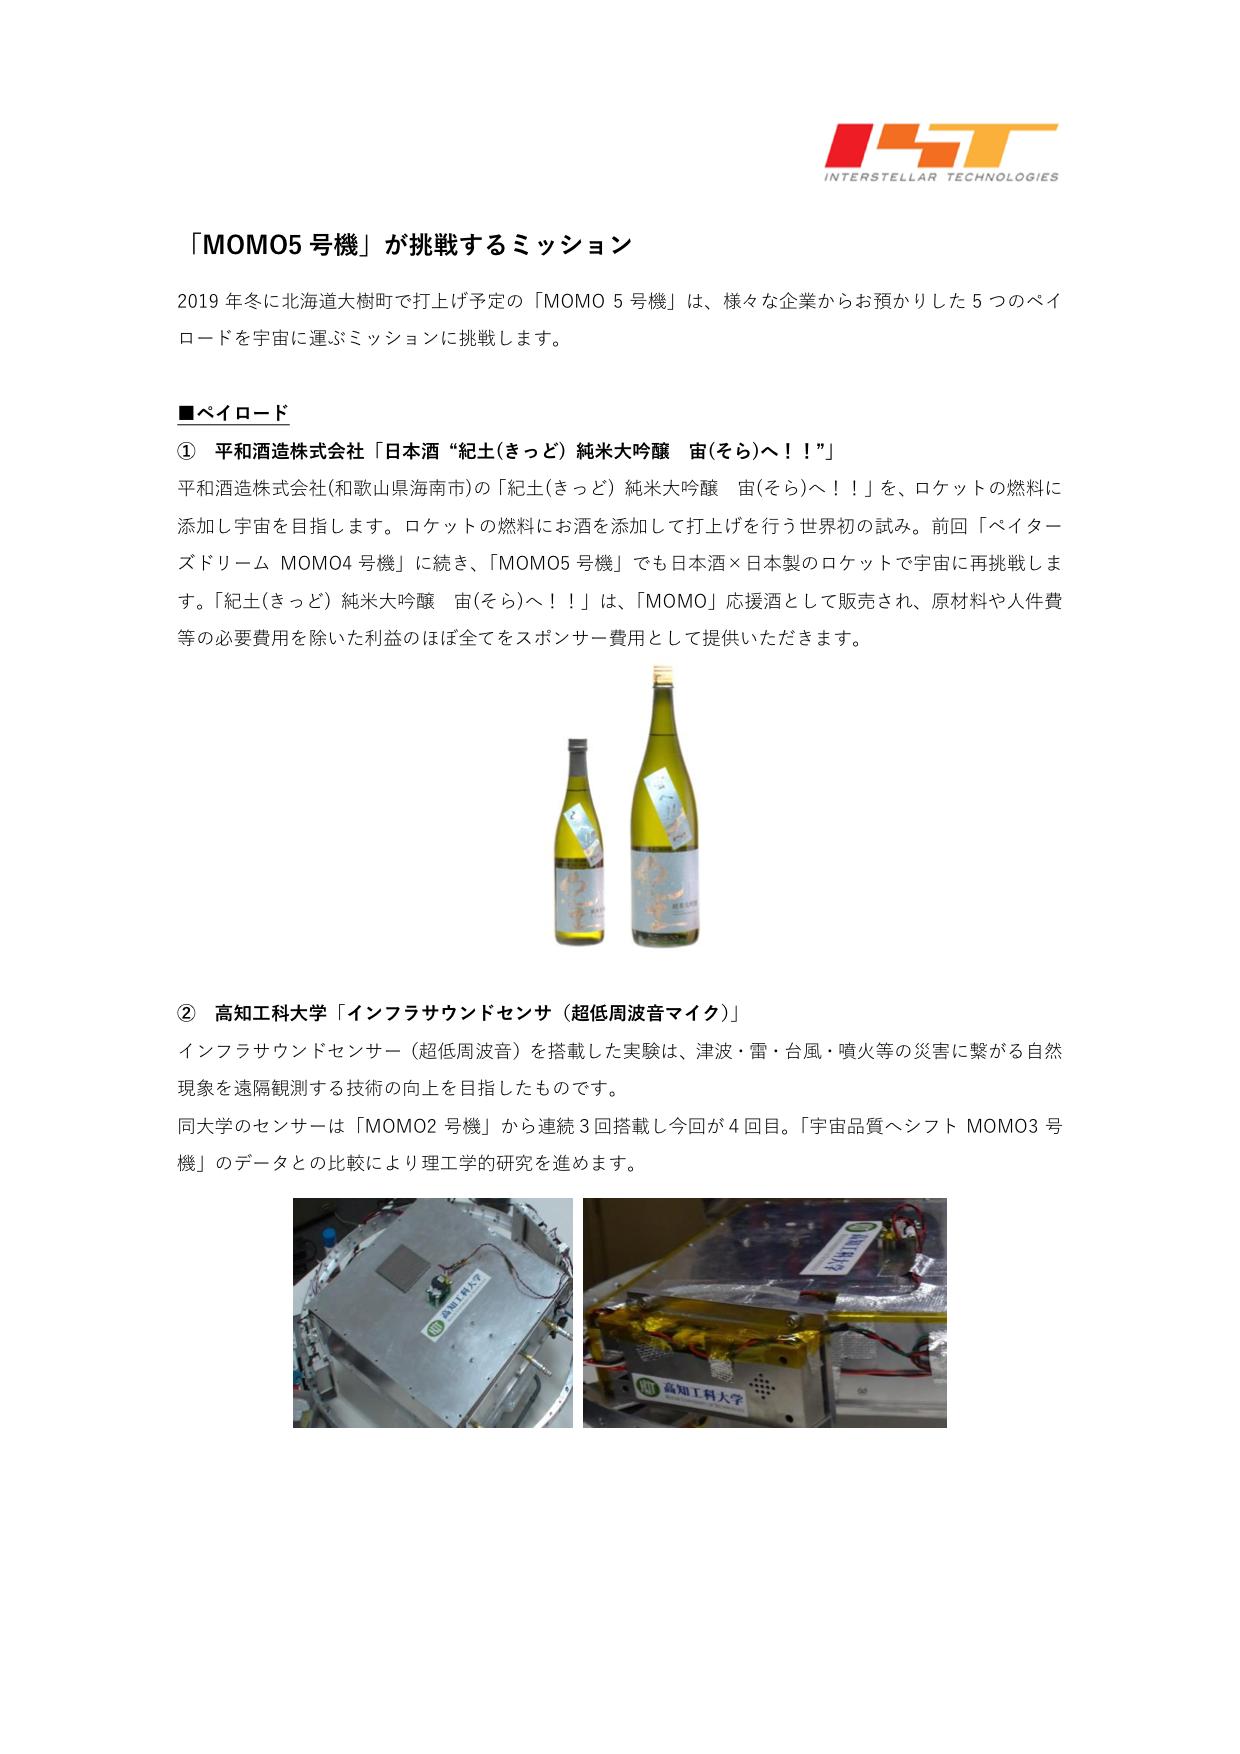 f:id:Imamura:20191126135418p:plain